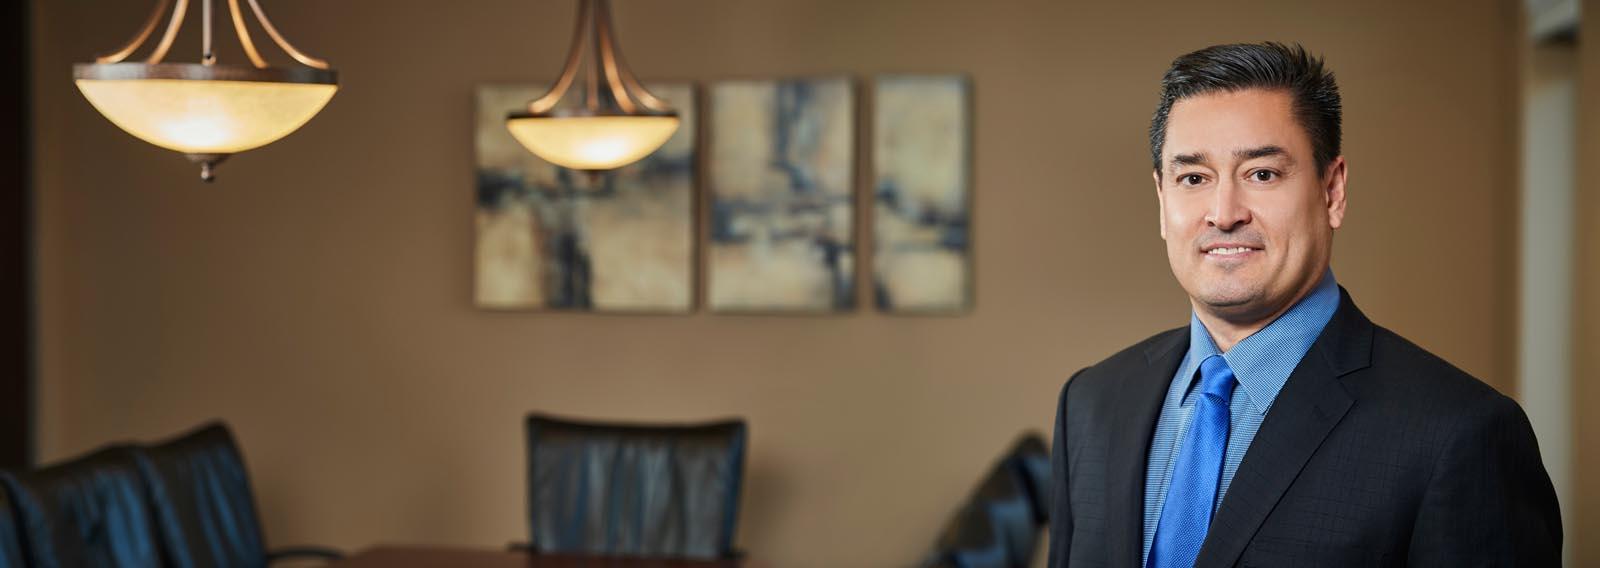 Ron_Sciannella_Millards Chartered Professional Accountants